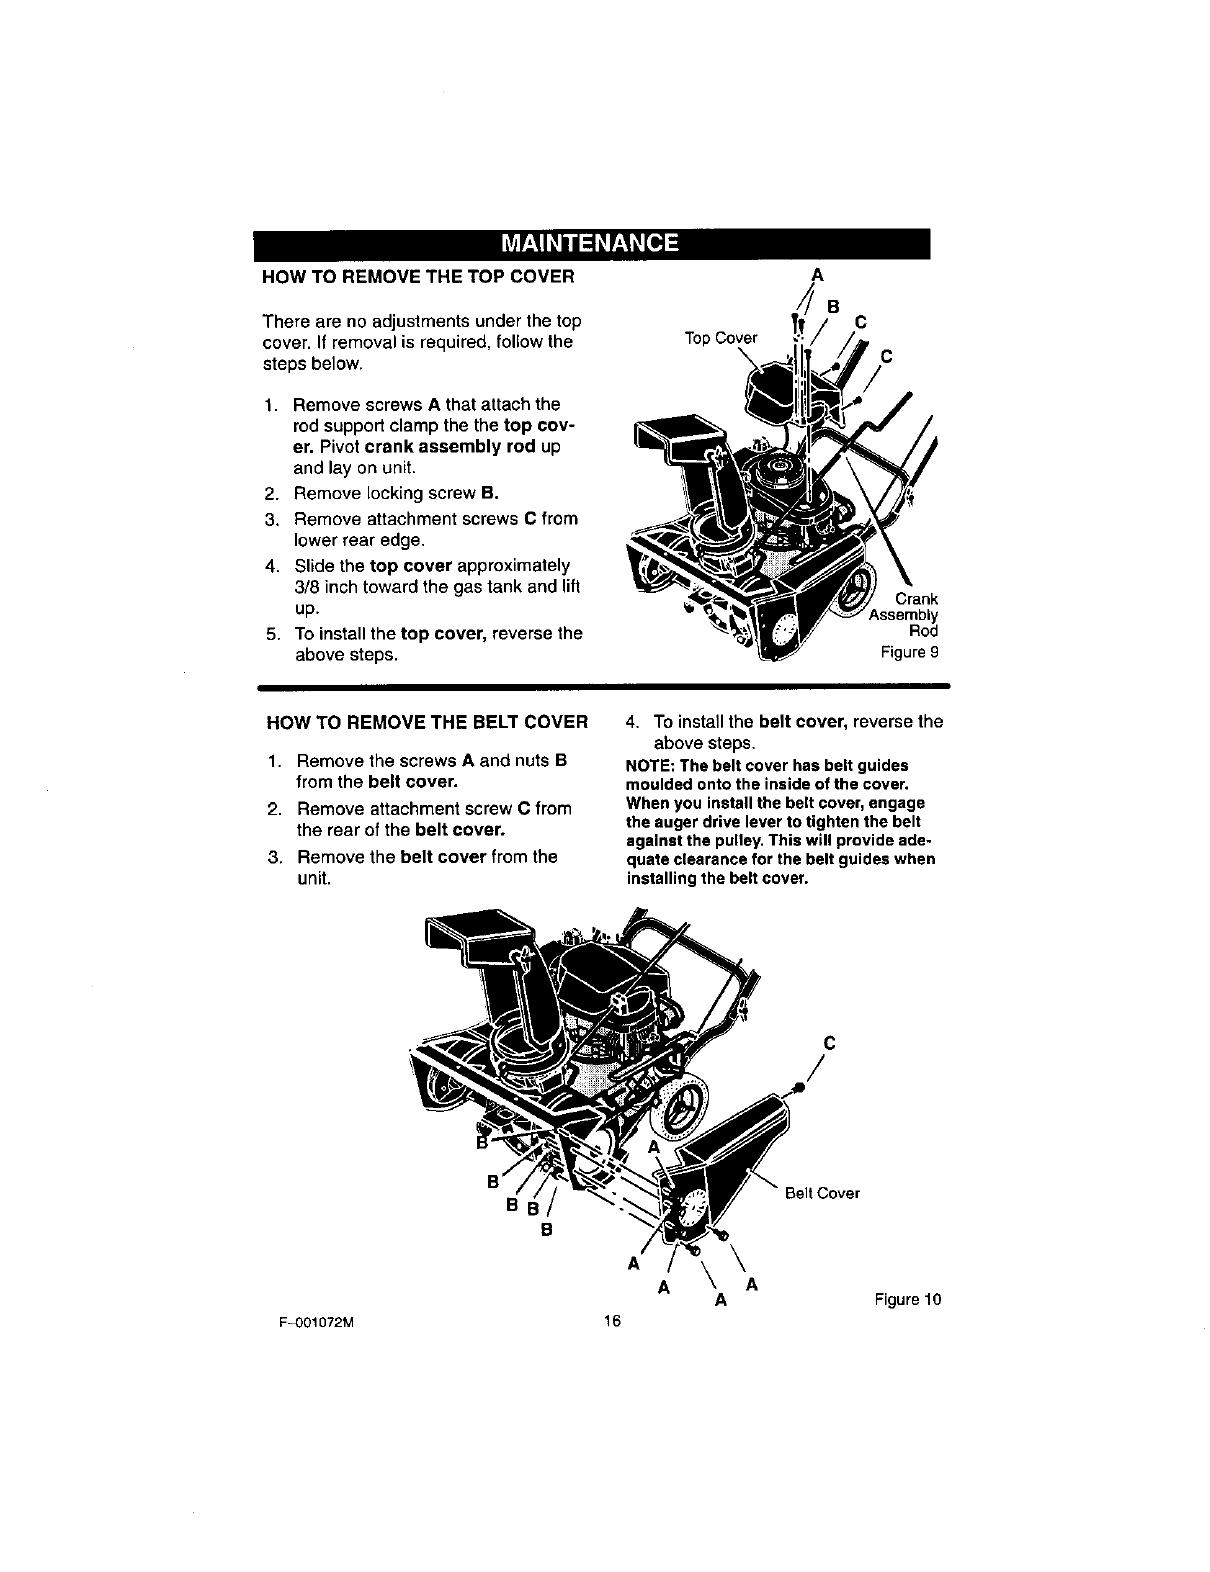 Craftsman 536 8852 Users Manual